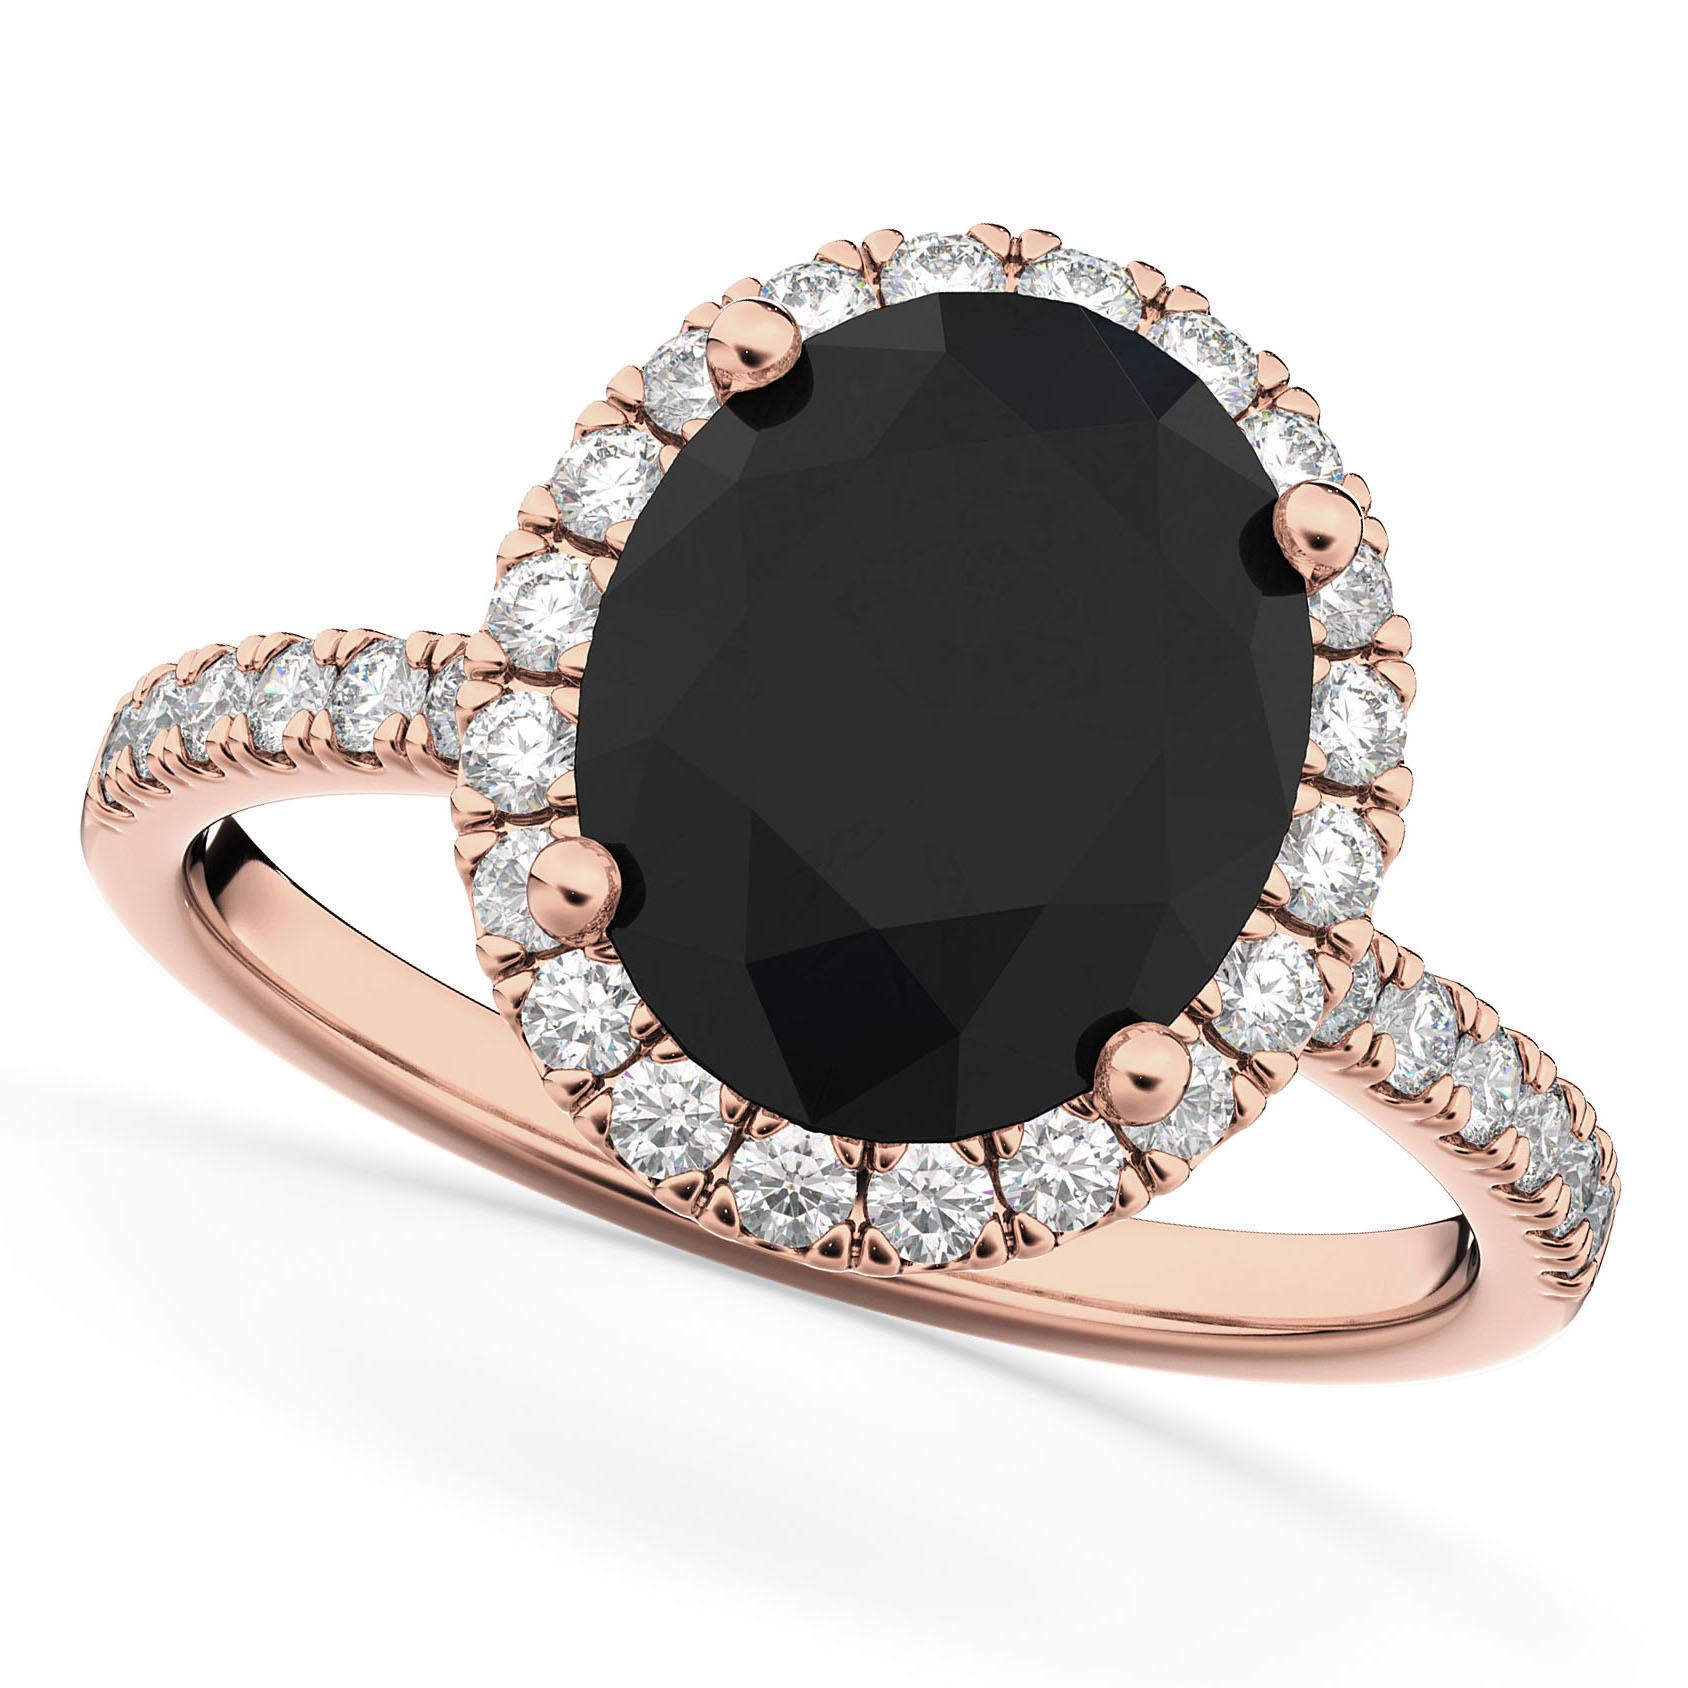 Oval Black Diamond & Diamond Engagement Ring 14K Rose Gold 3.51ct